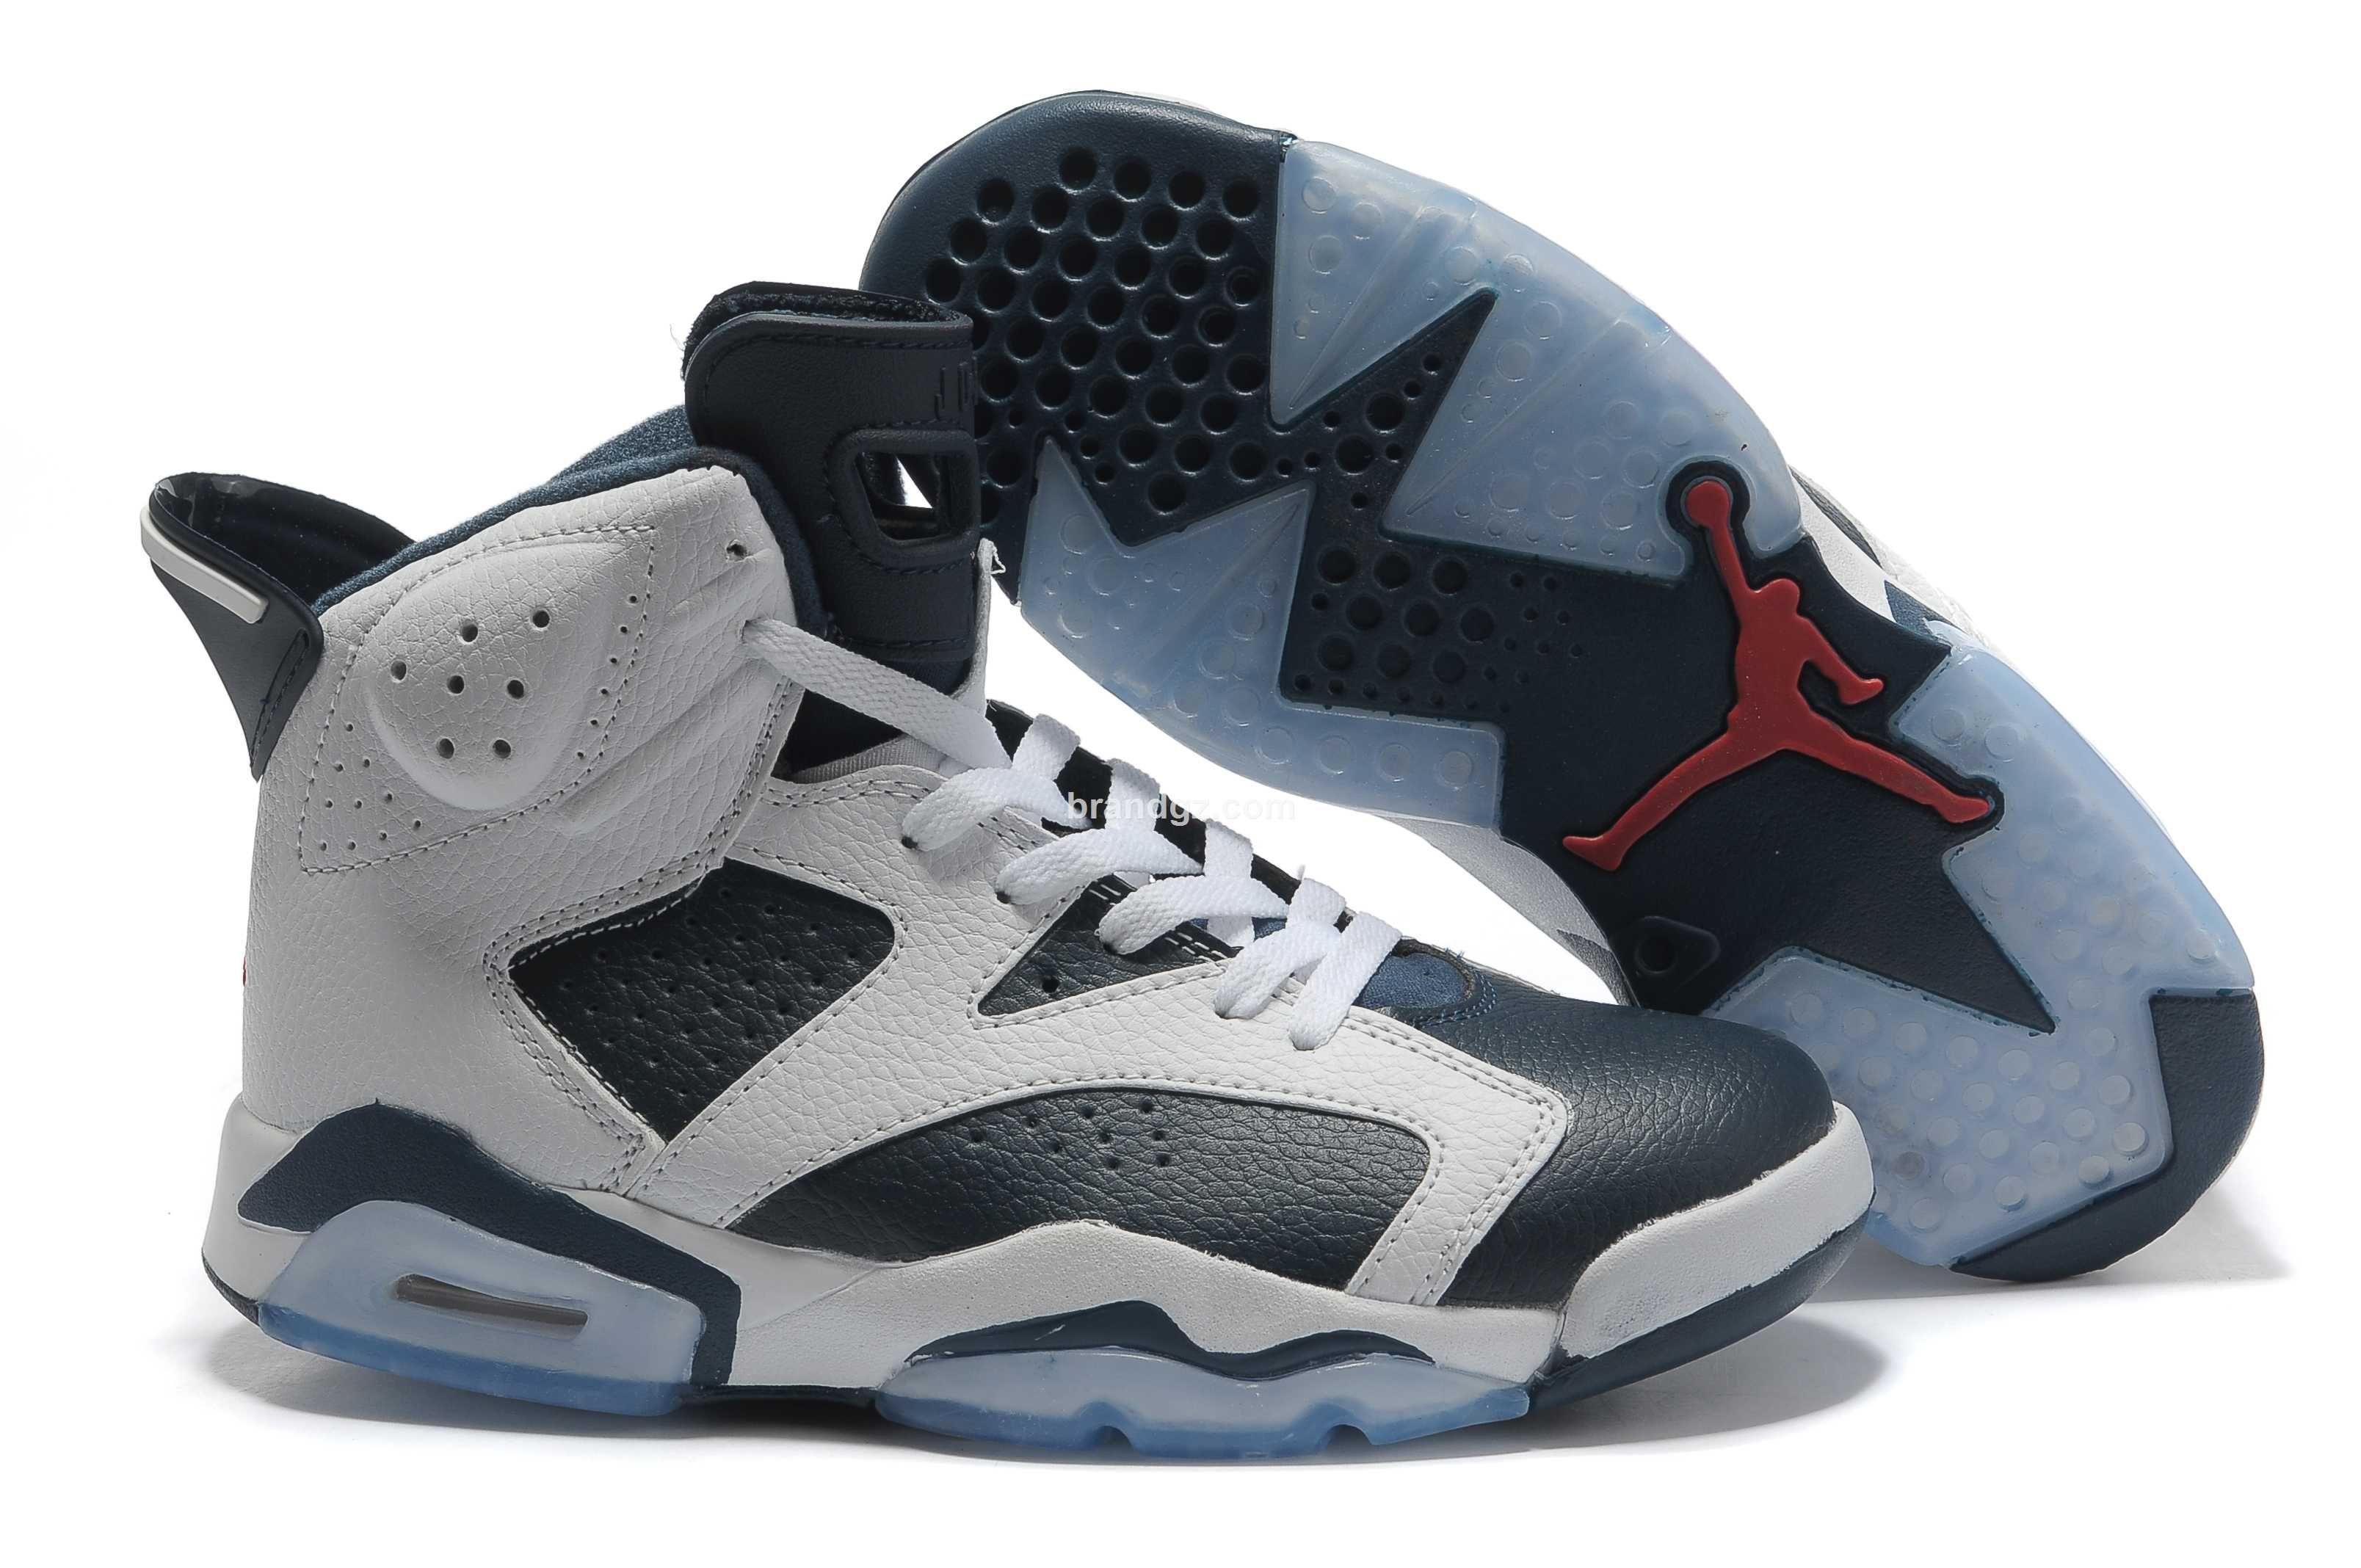 All Jordan Shoes   body double photos: pictures of all jordan shoes   hilda    Pinterest   Double photo